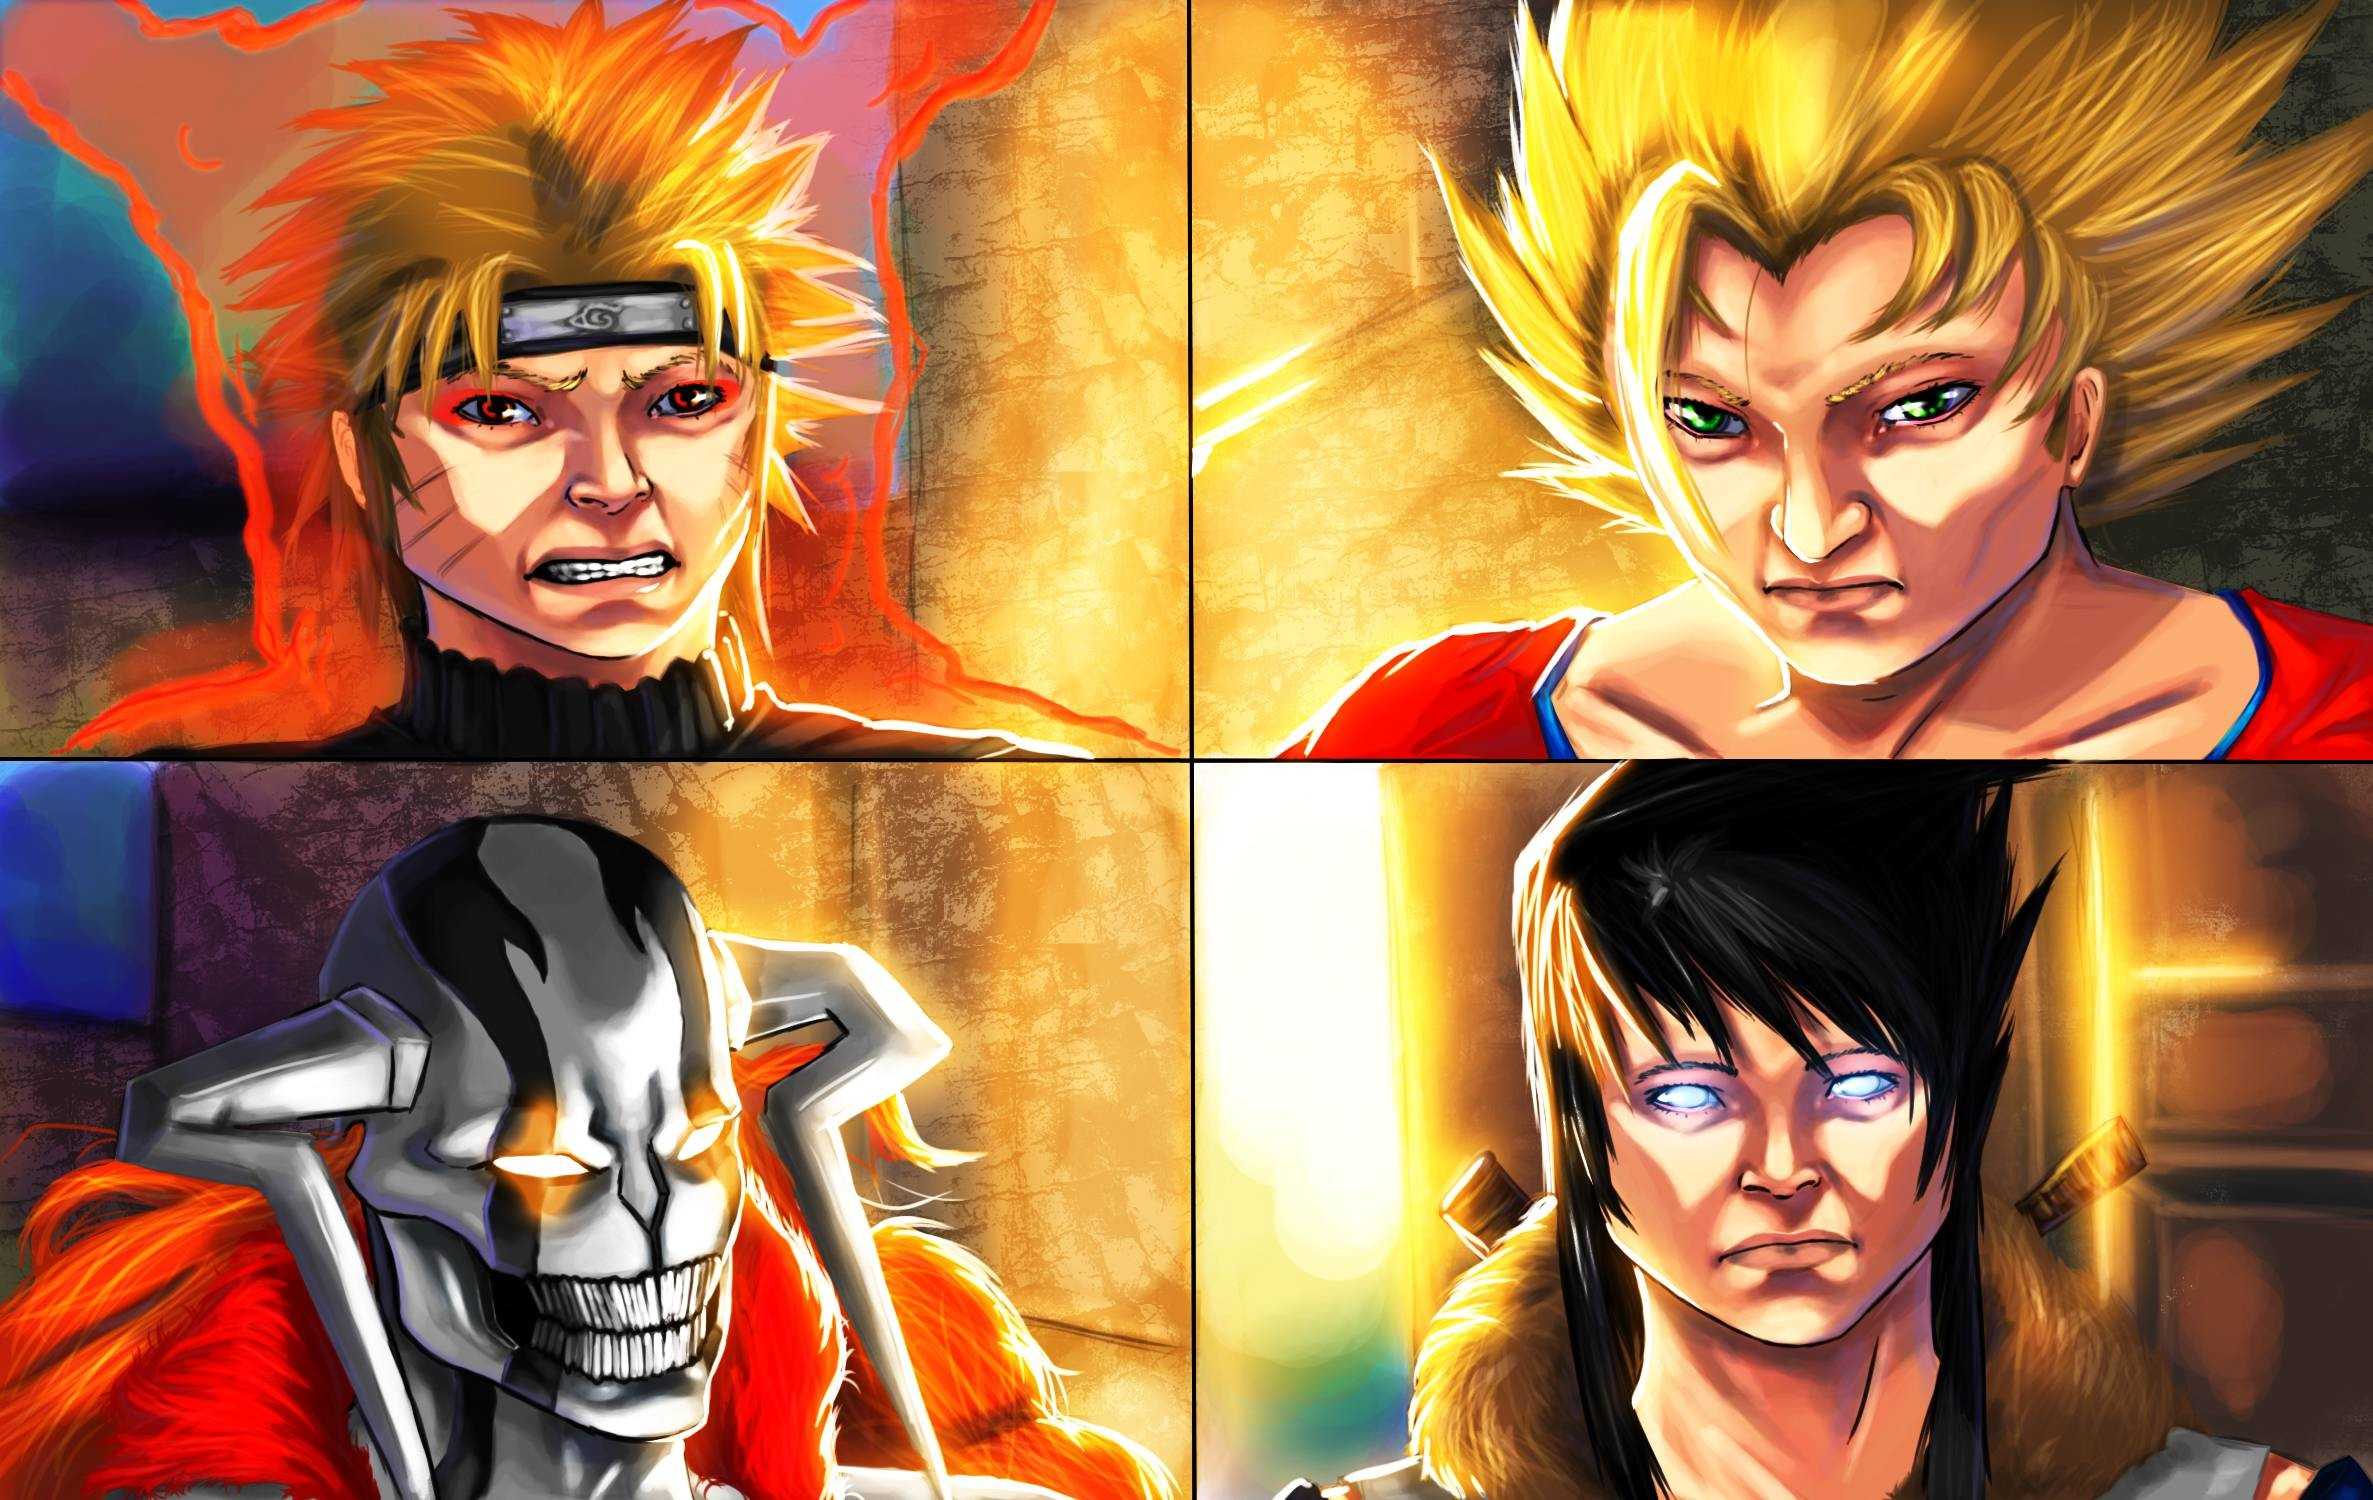 Naruto And Goku Wallpaper 74 Images